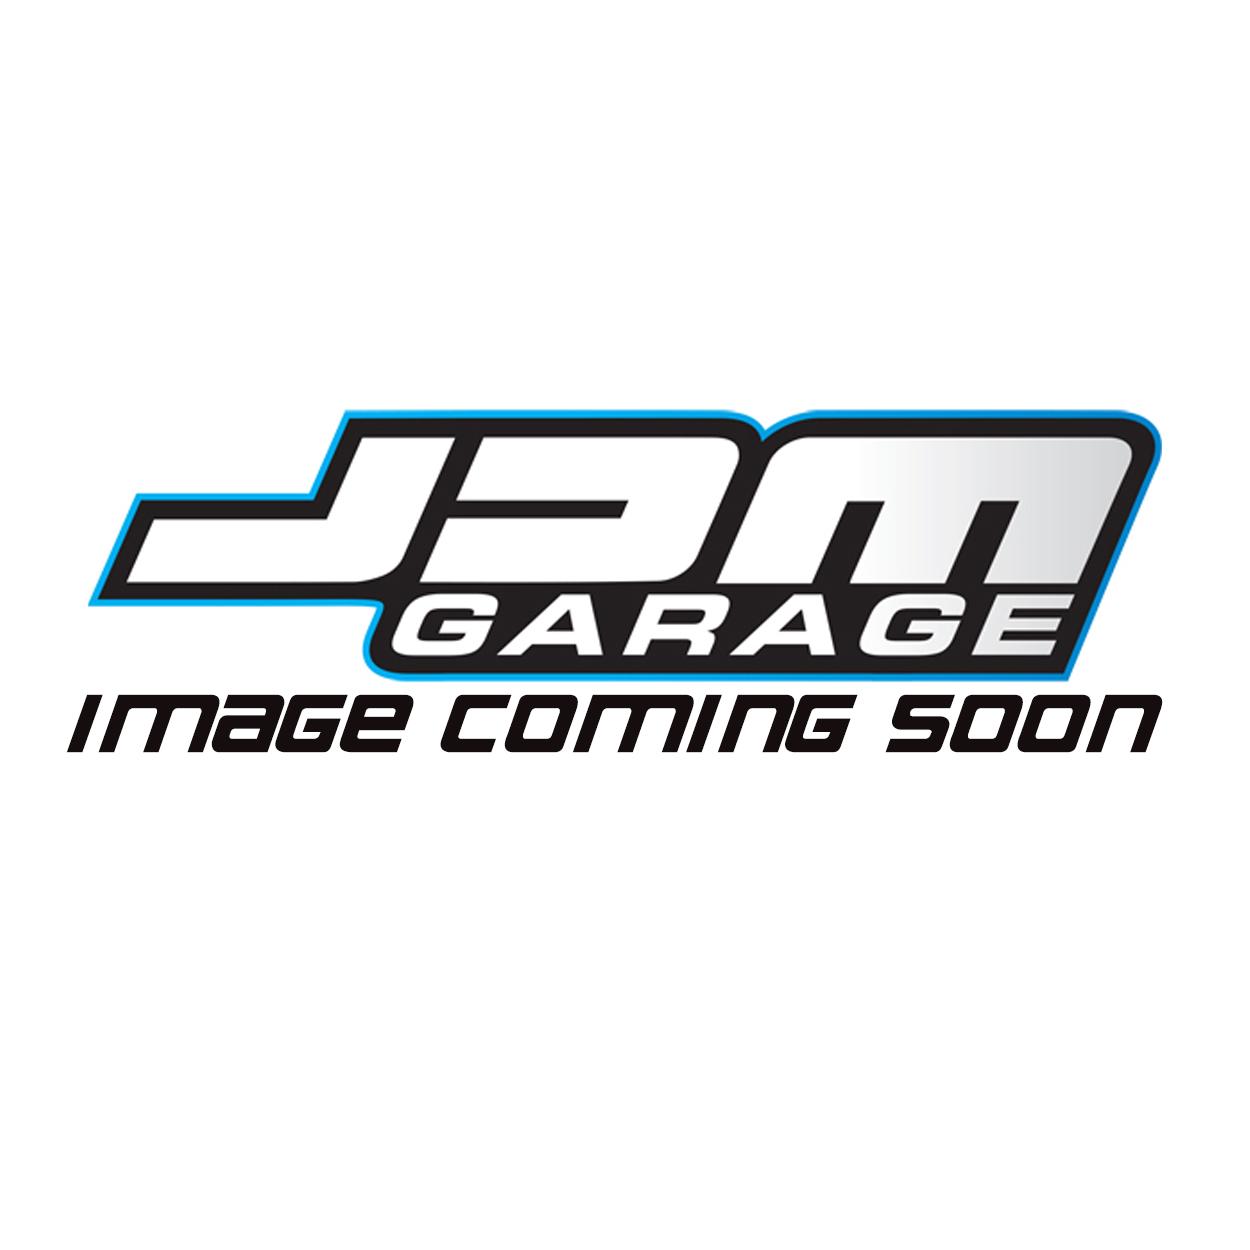 Oil Cooler Kit - BMW - E36 3 Series / E46 3 Series / E82 1 Series / E90 E91 1 & 3 Series / E92 3 Series